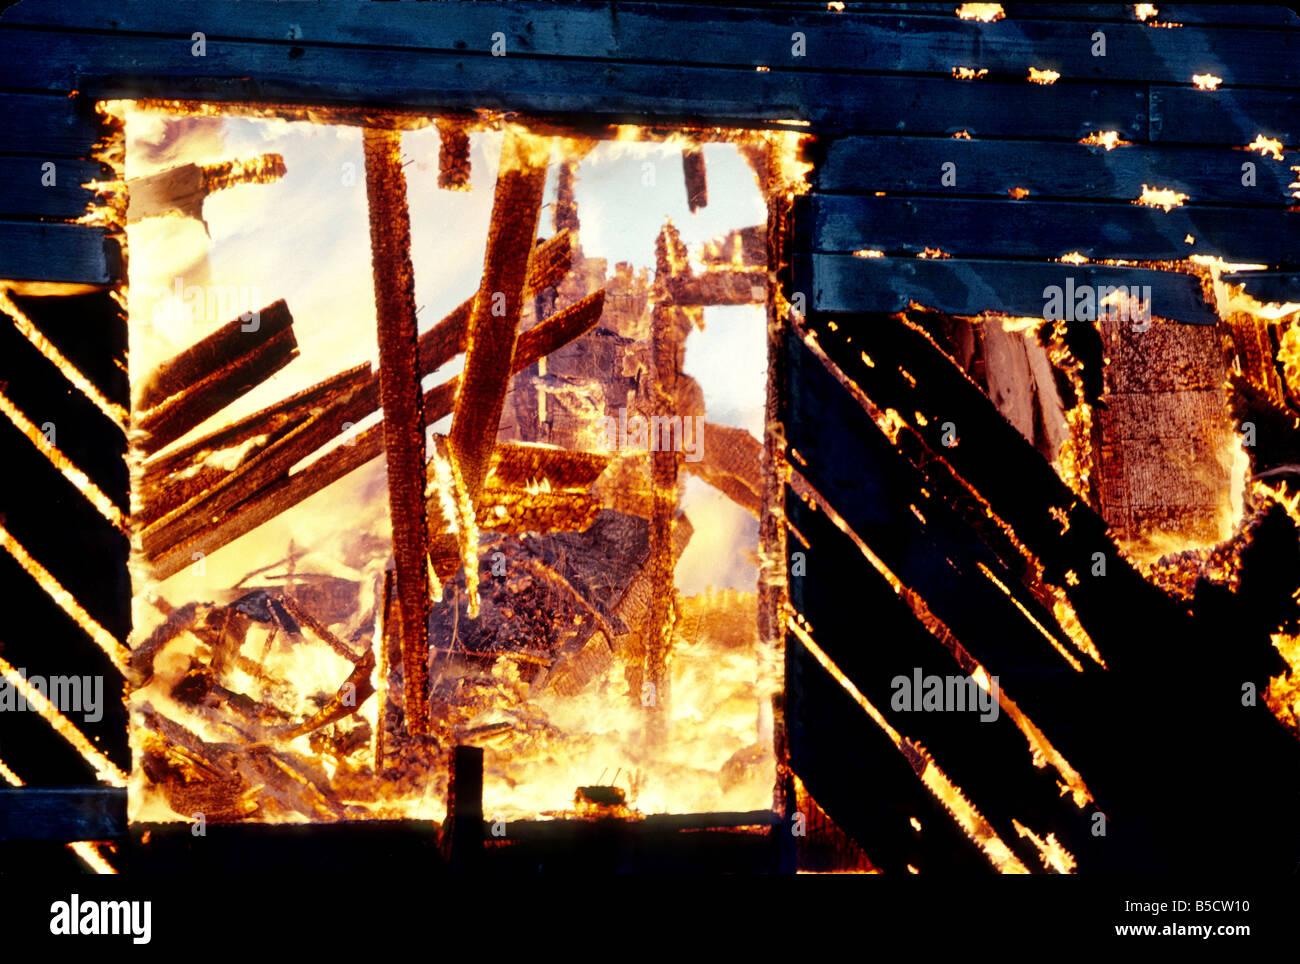 Inferno, engulfed interior. - Stock Image